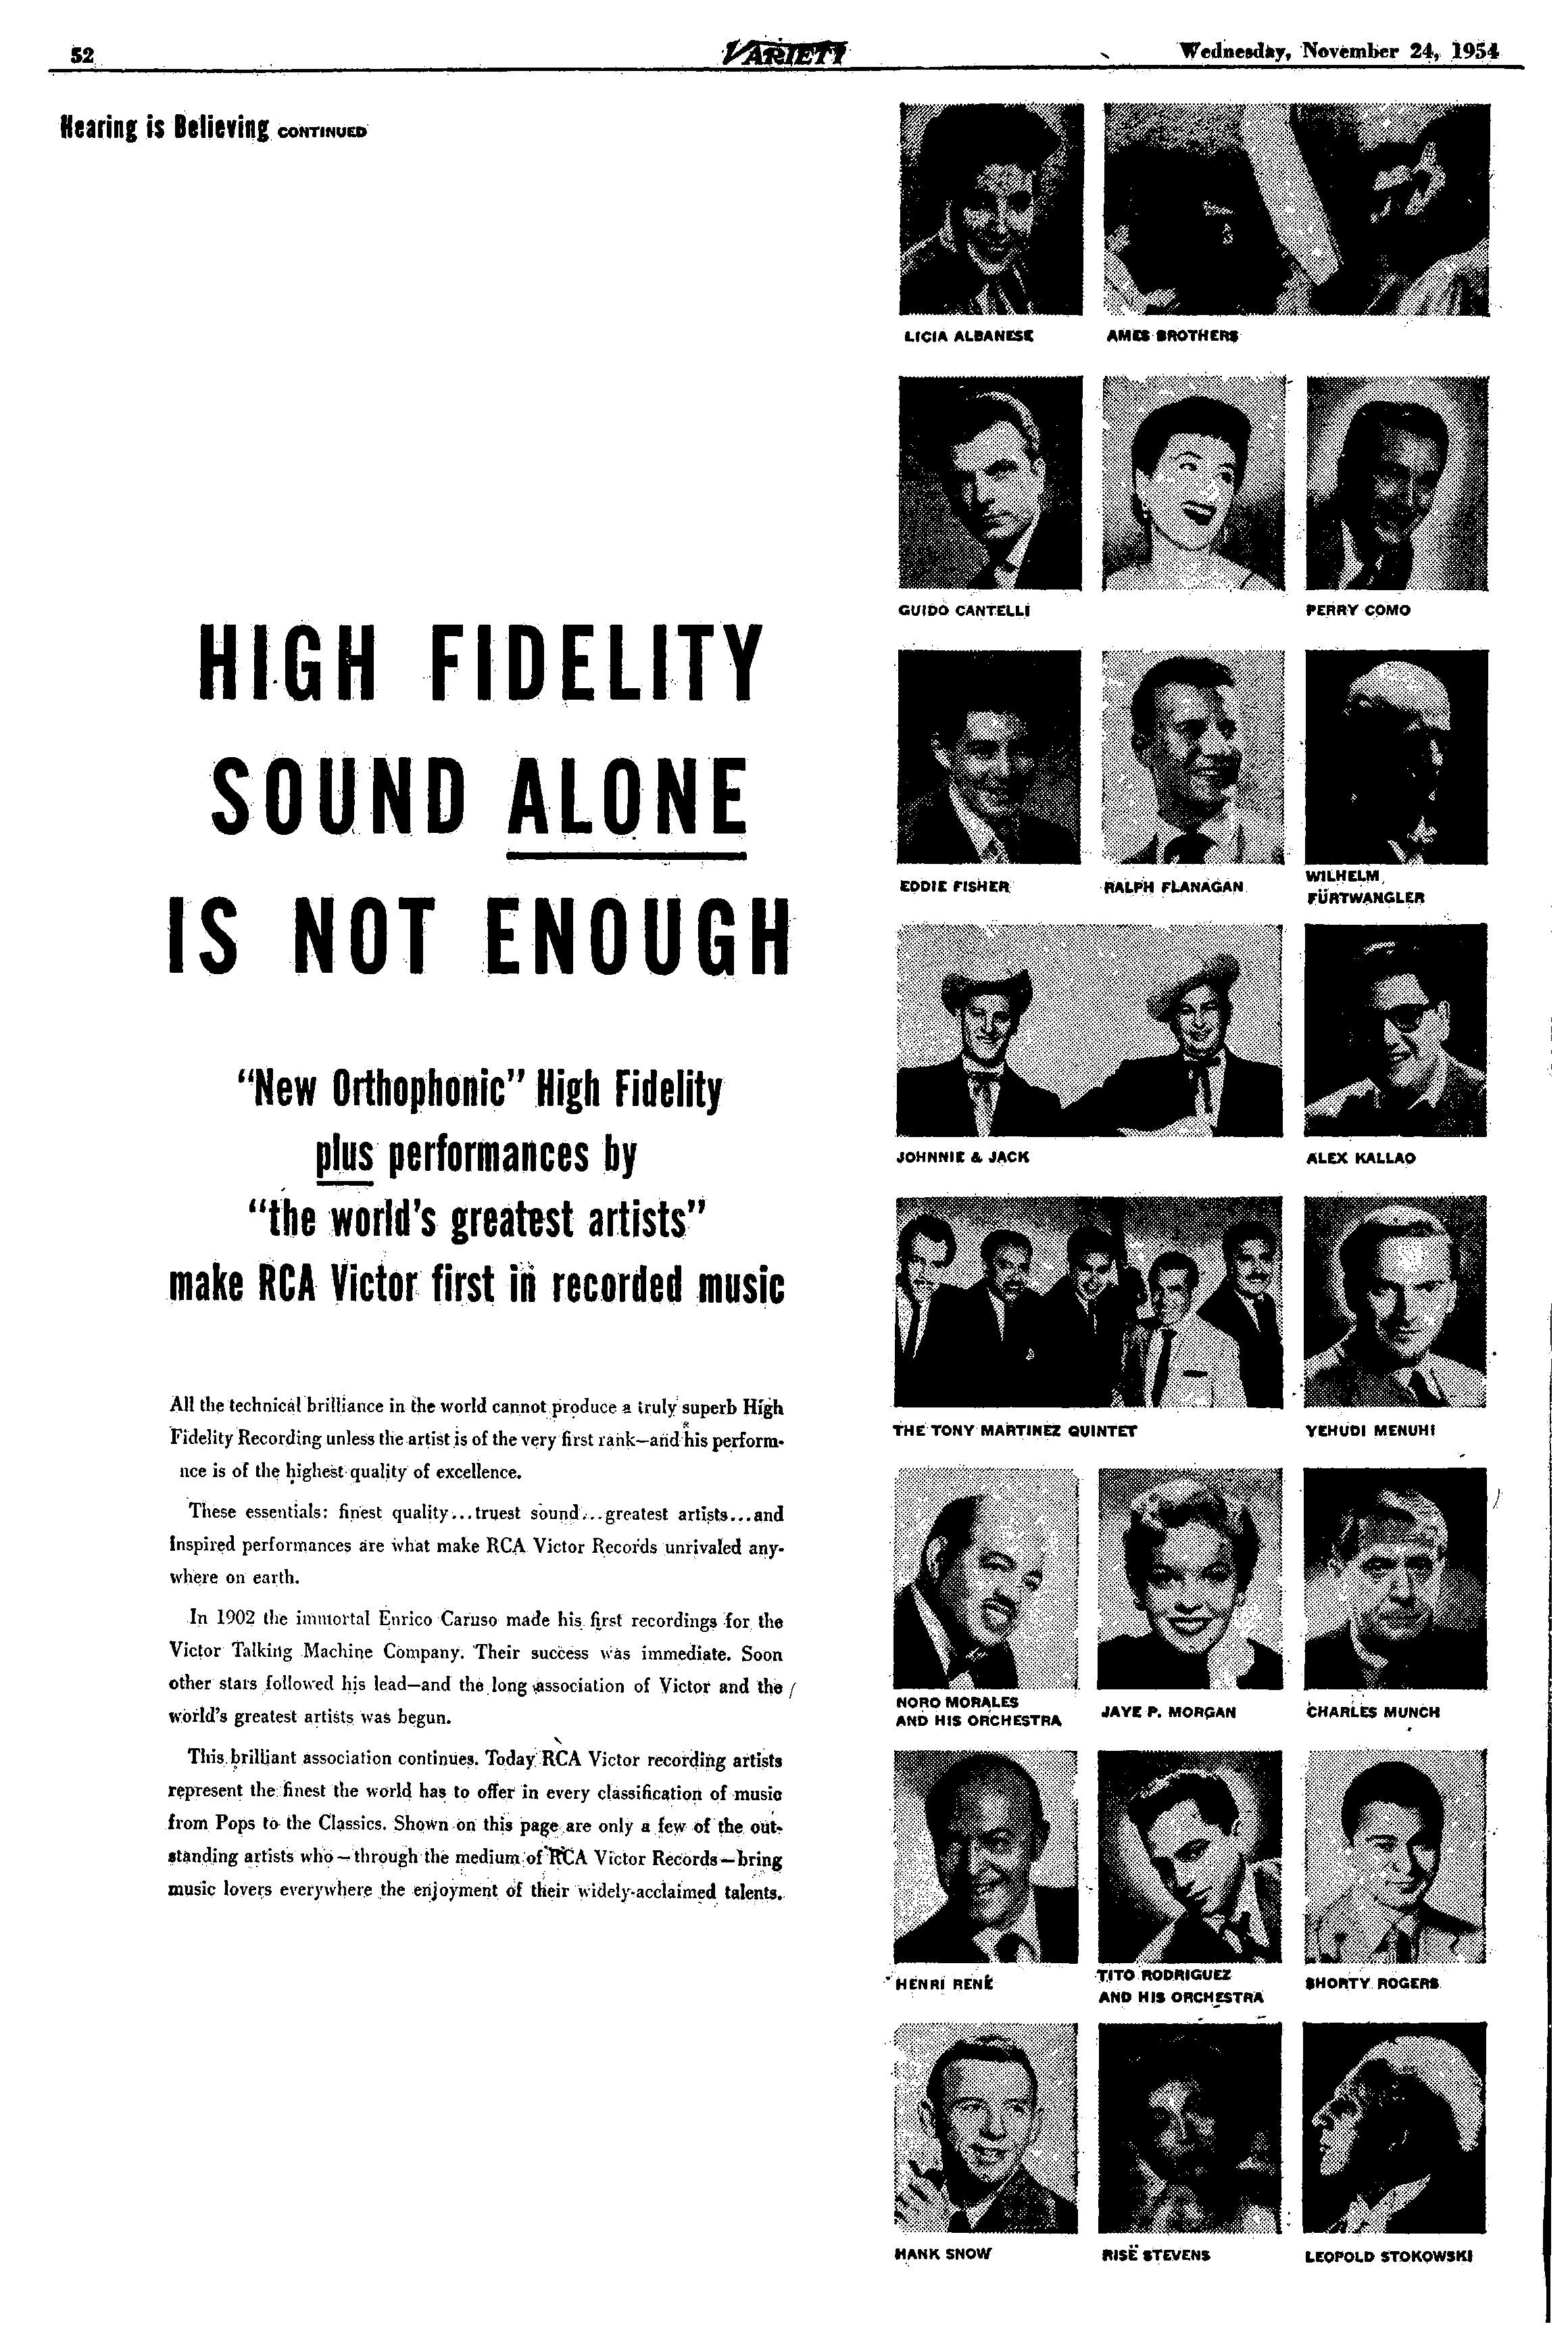 Variety196-1954-11_jp2.zip&file=variety196-1954-11_jp2%2fvariety196-1954-11_0267